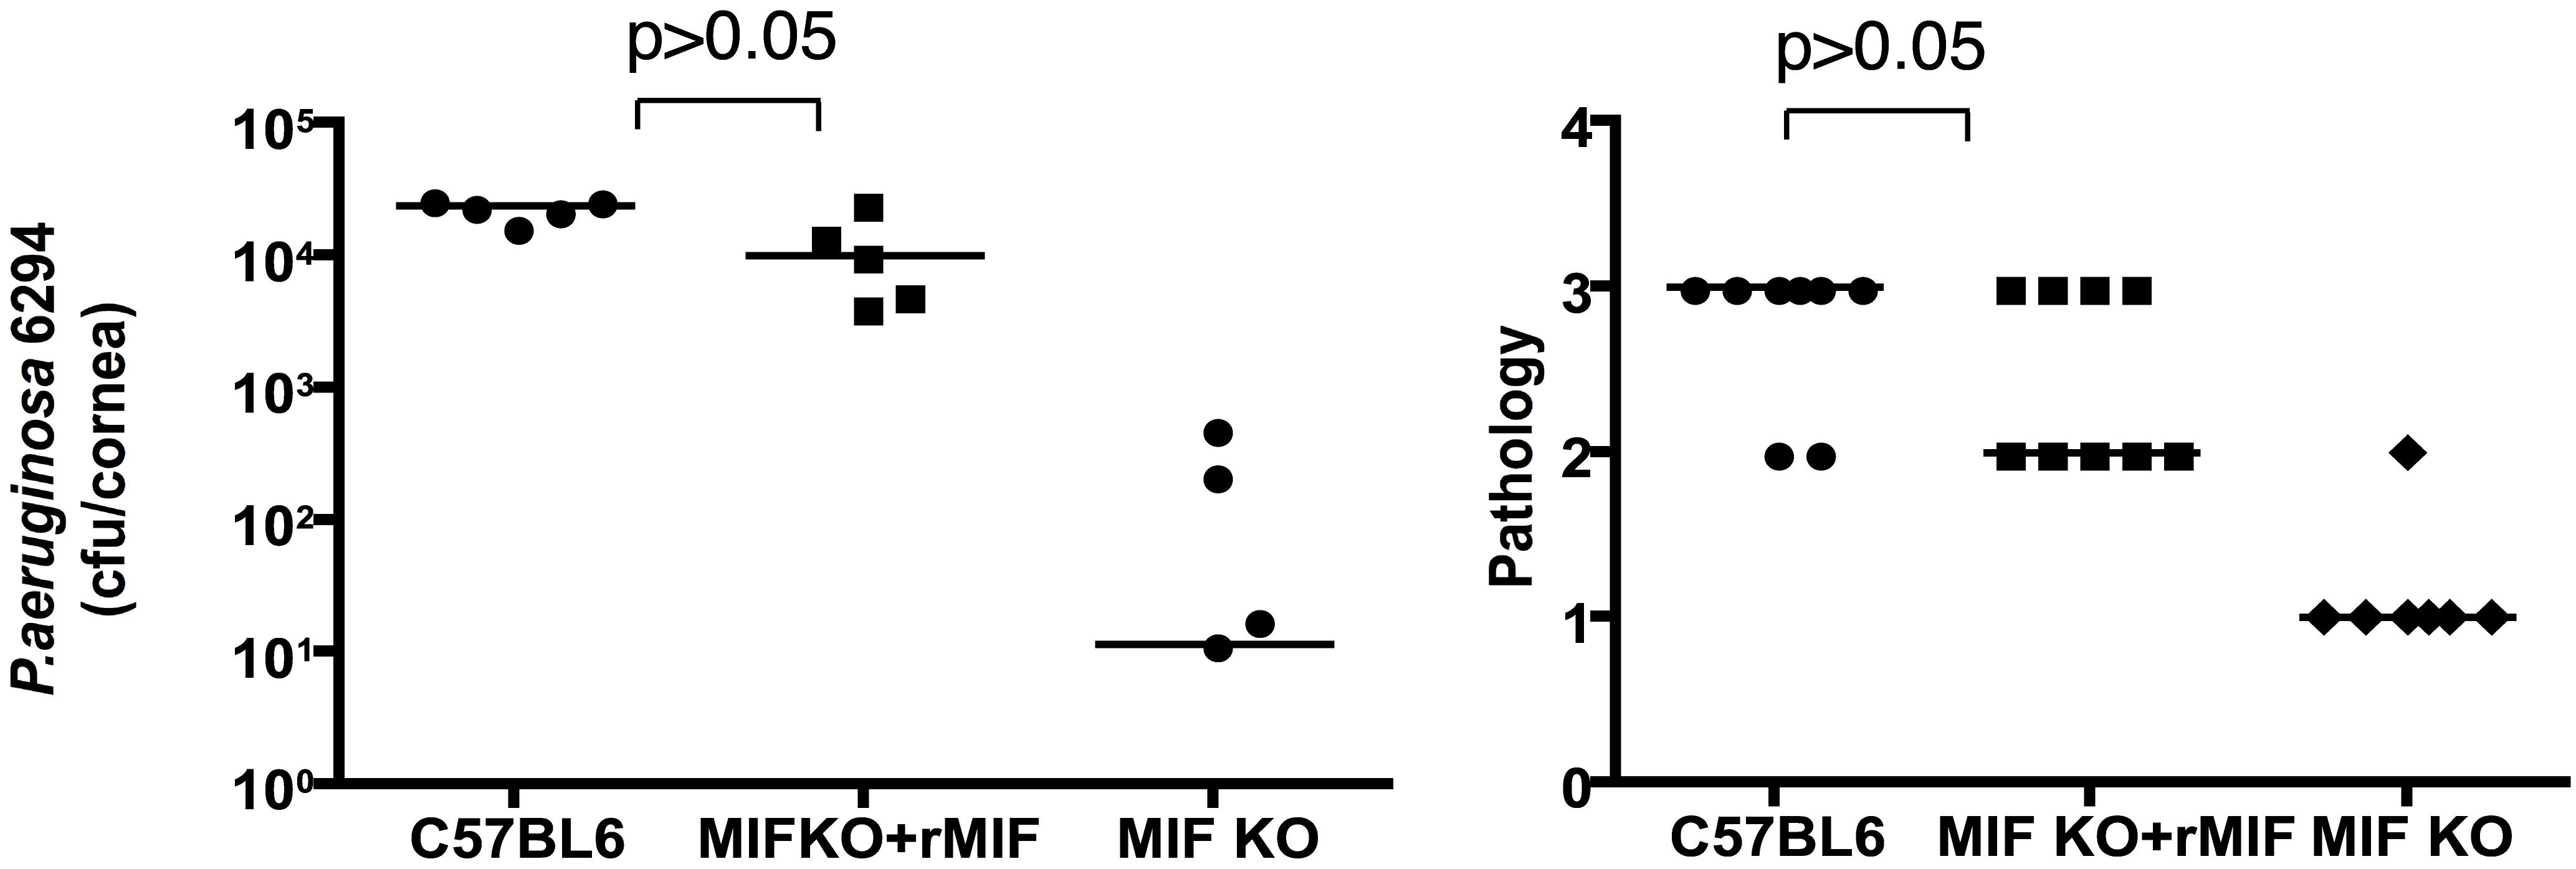 rMIF restores sensitivity to <i>P. aeruginosa</i>-induced disease in MIF KO mice.